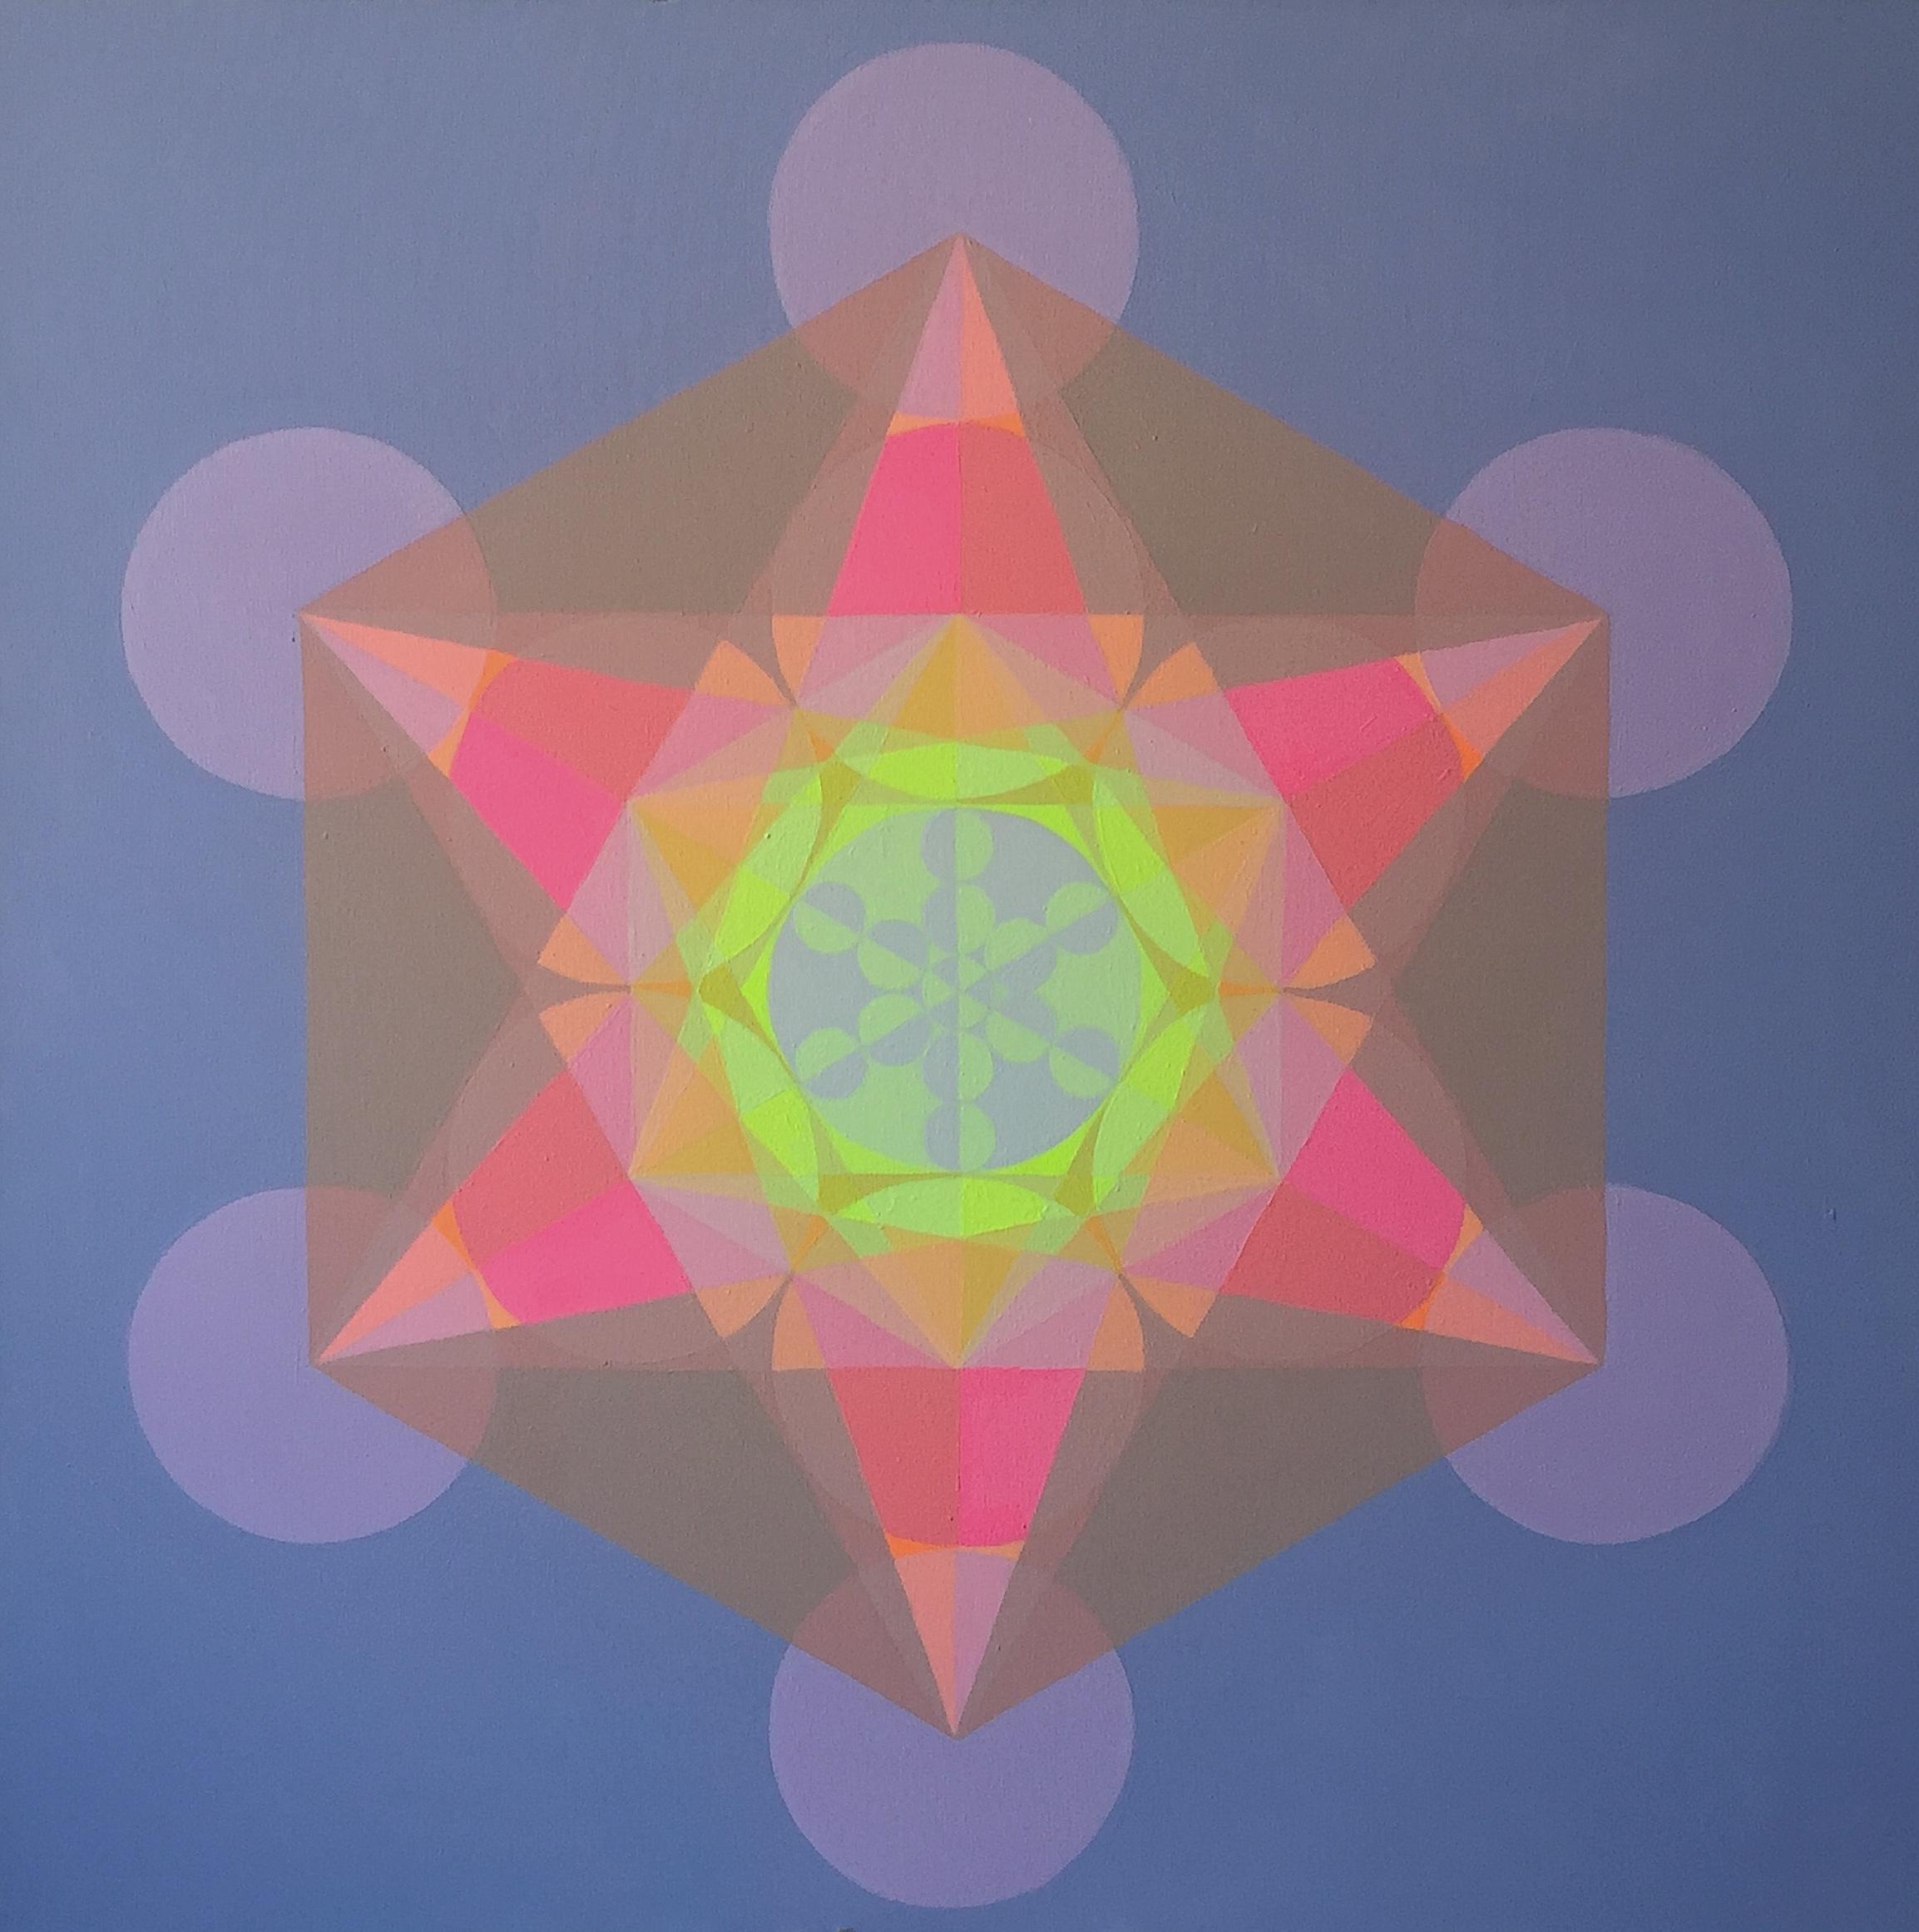 "Light Merkaba, 2015, 40"" x 40"", acrylic on canvas"